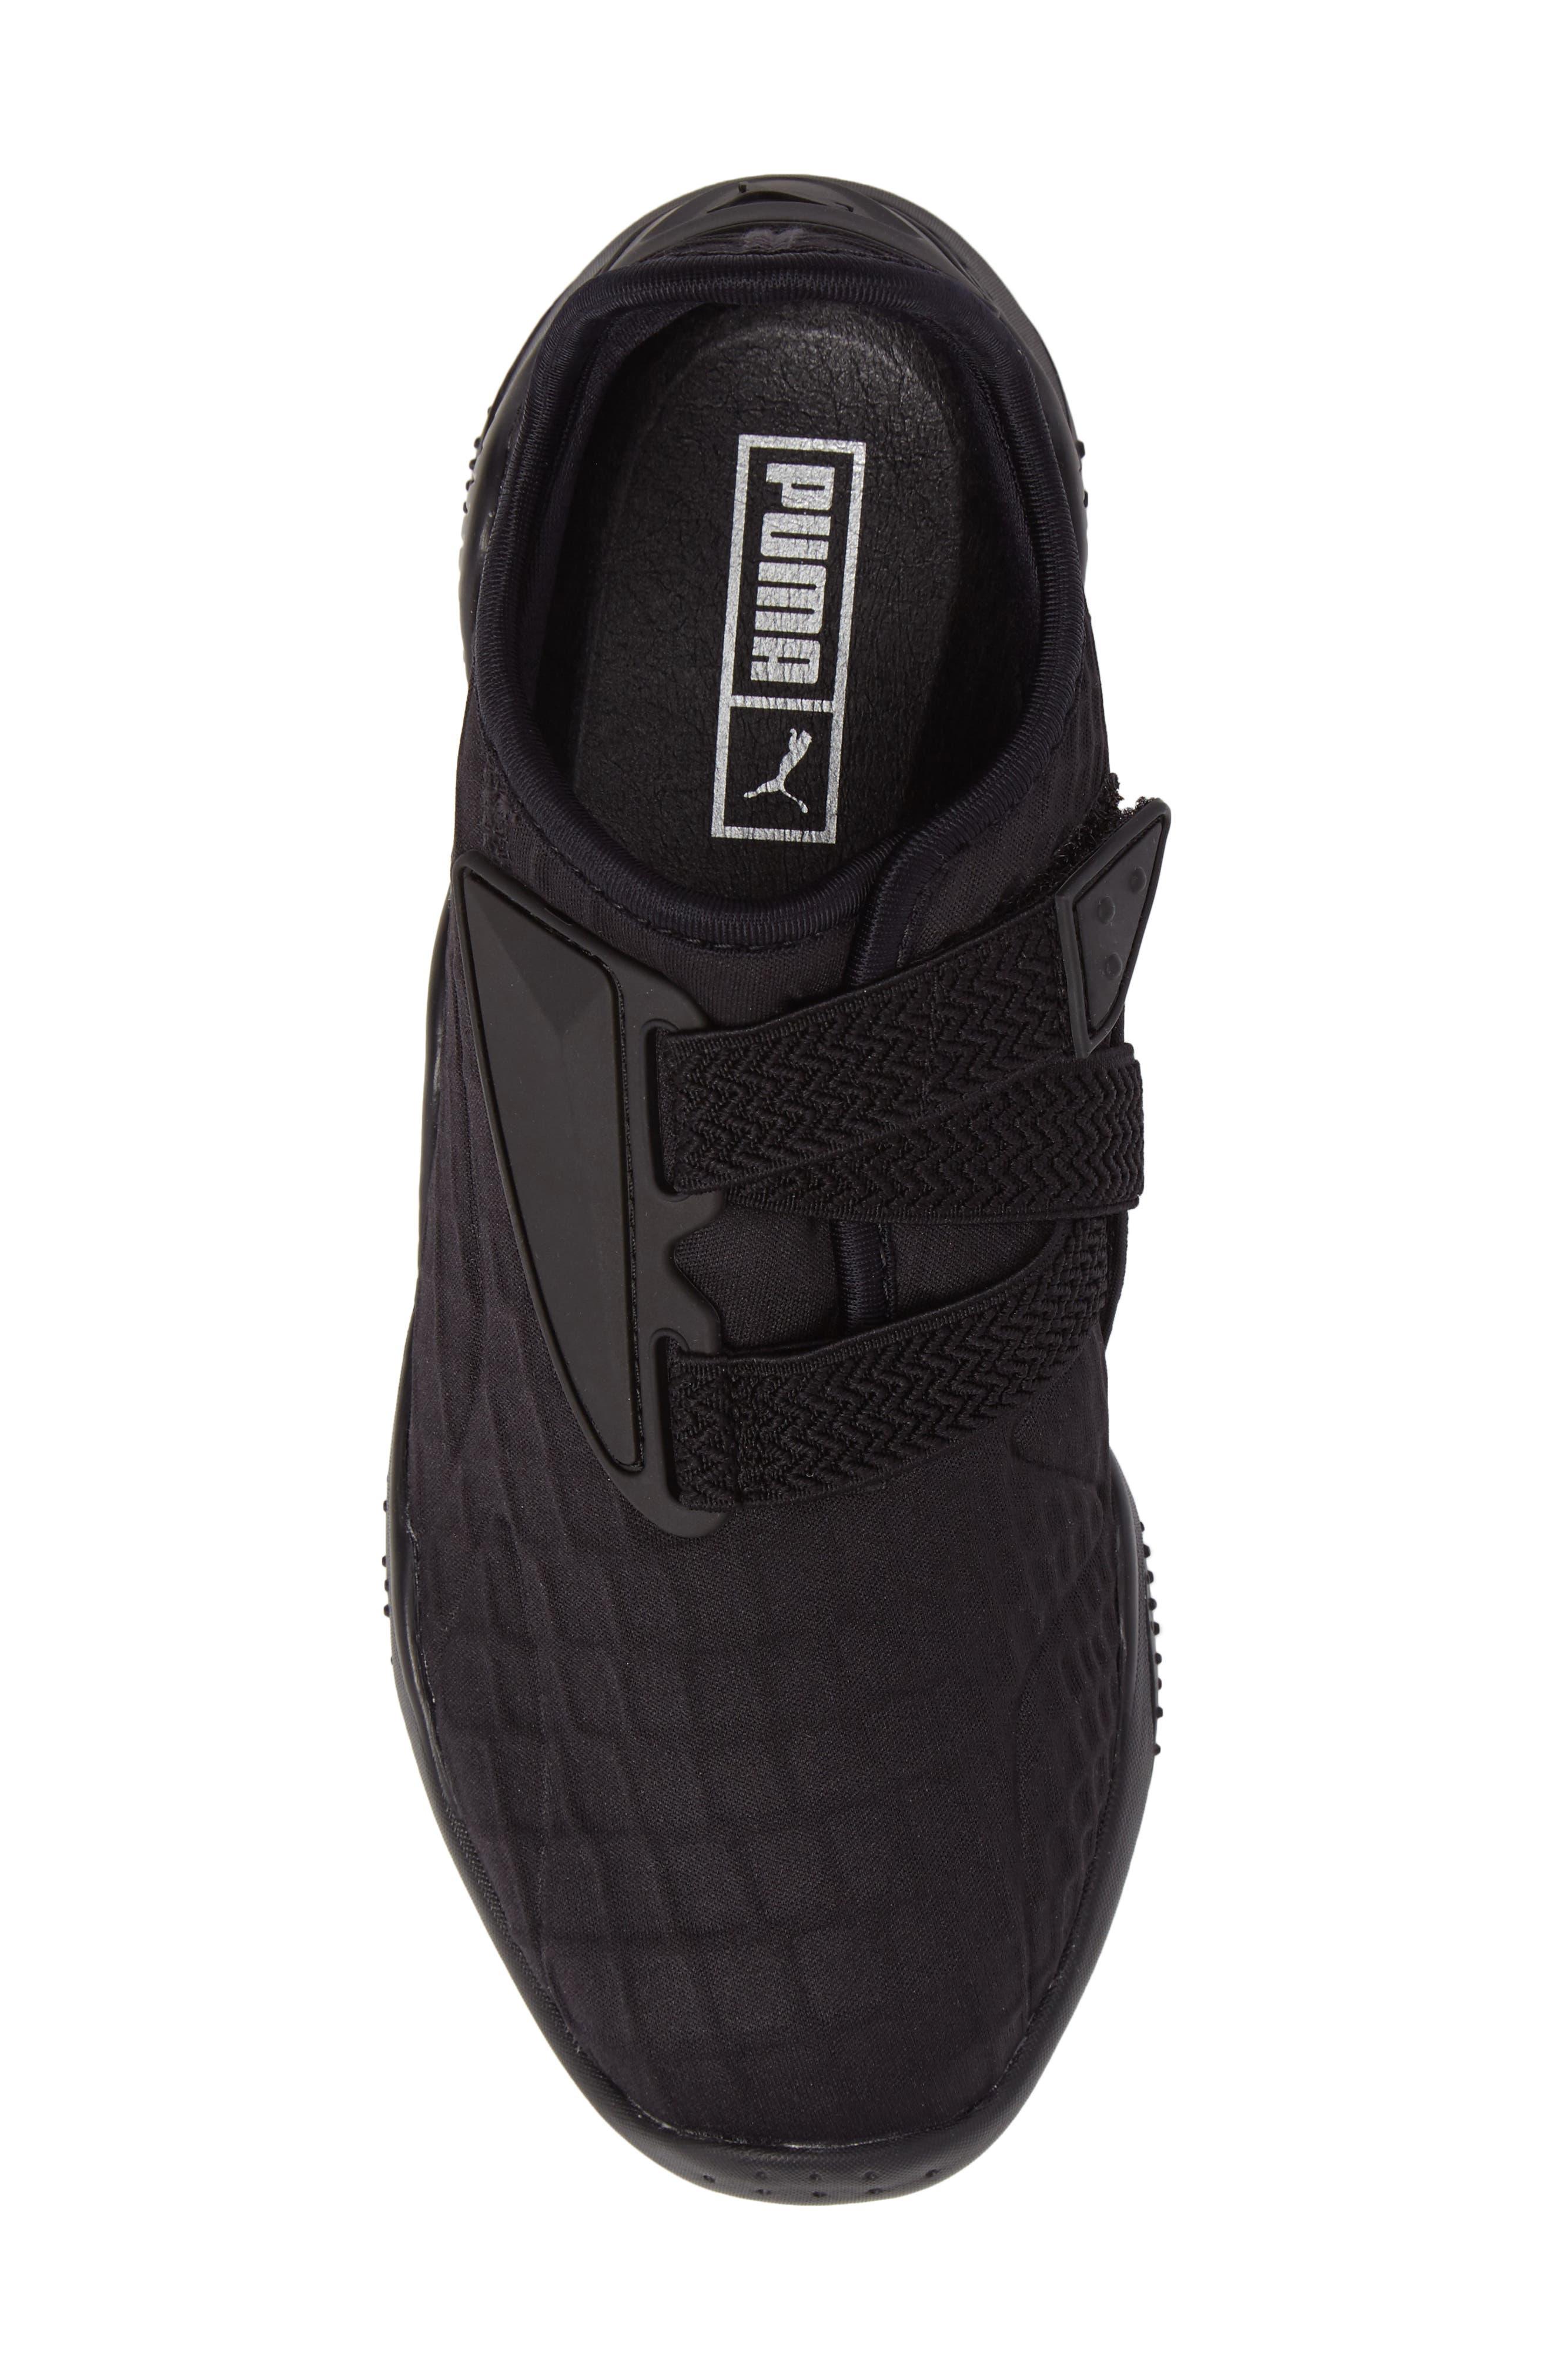 Mostro Fashion Sneaker,                             Alternate thumbnail 5, color,                             Puma Black/ Puma Black